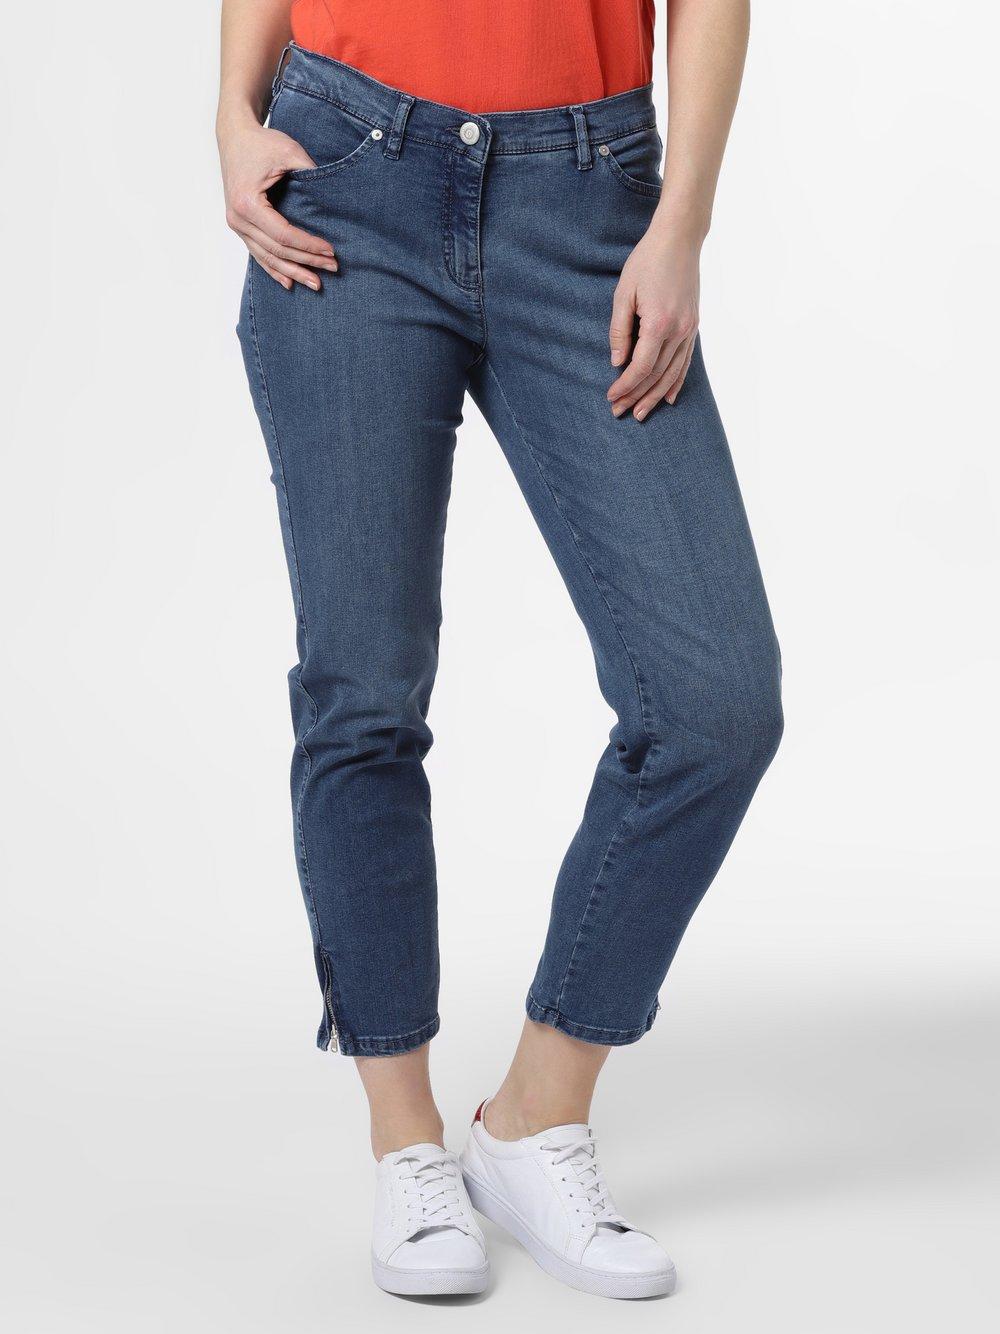 TONI – Jeansy damskie – Perfect Shape Zip, niebieski Van Graaf 464307-0002-00380